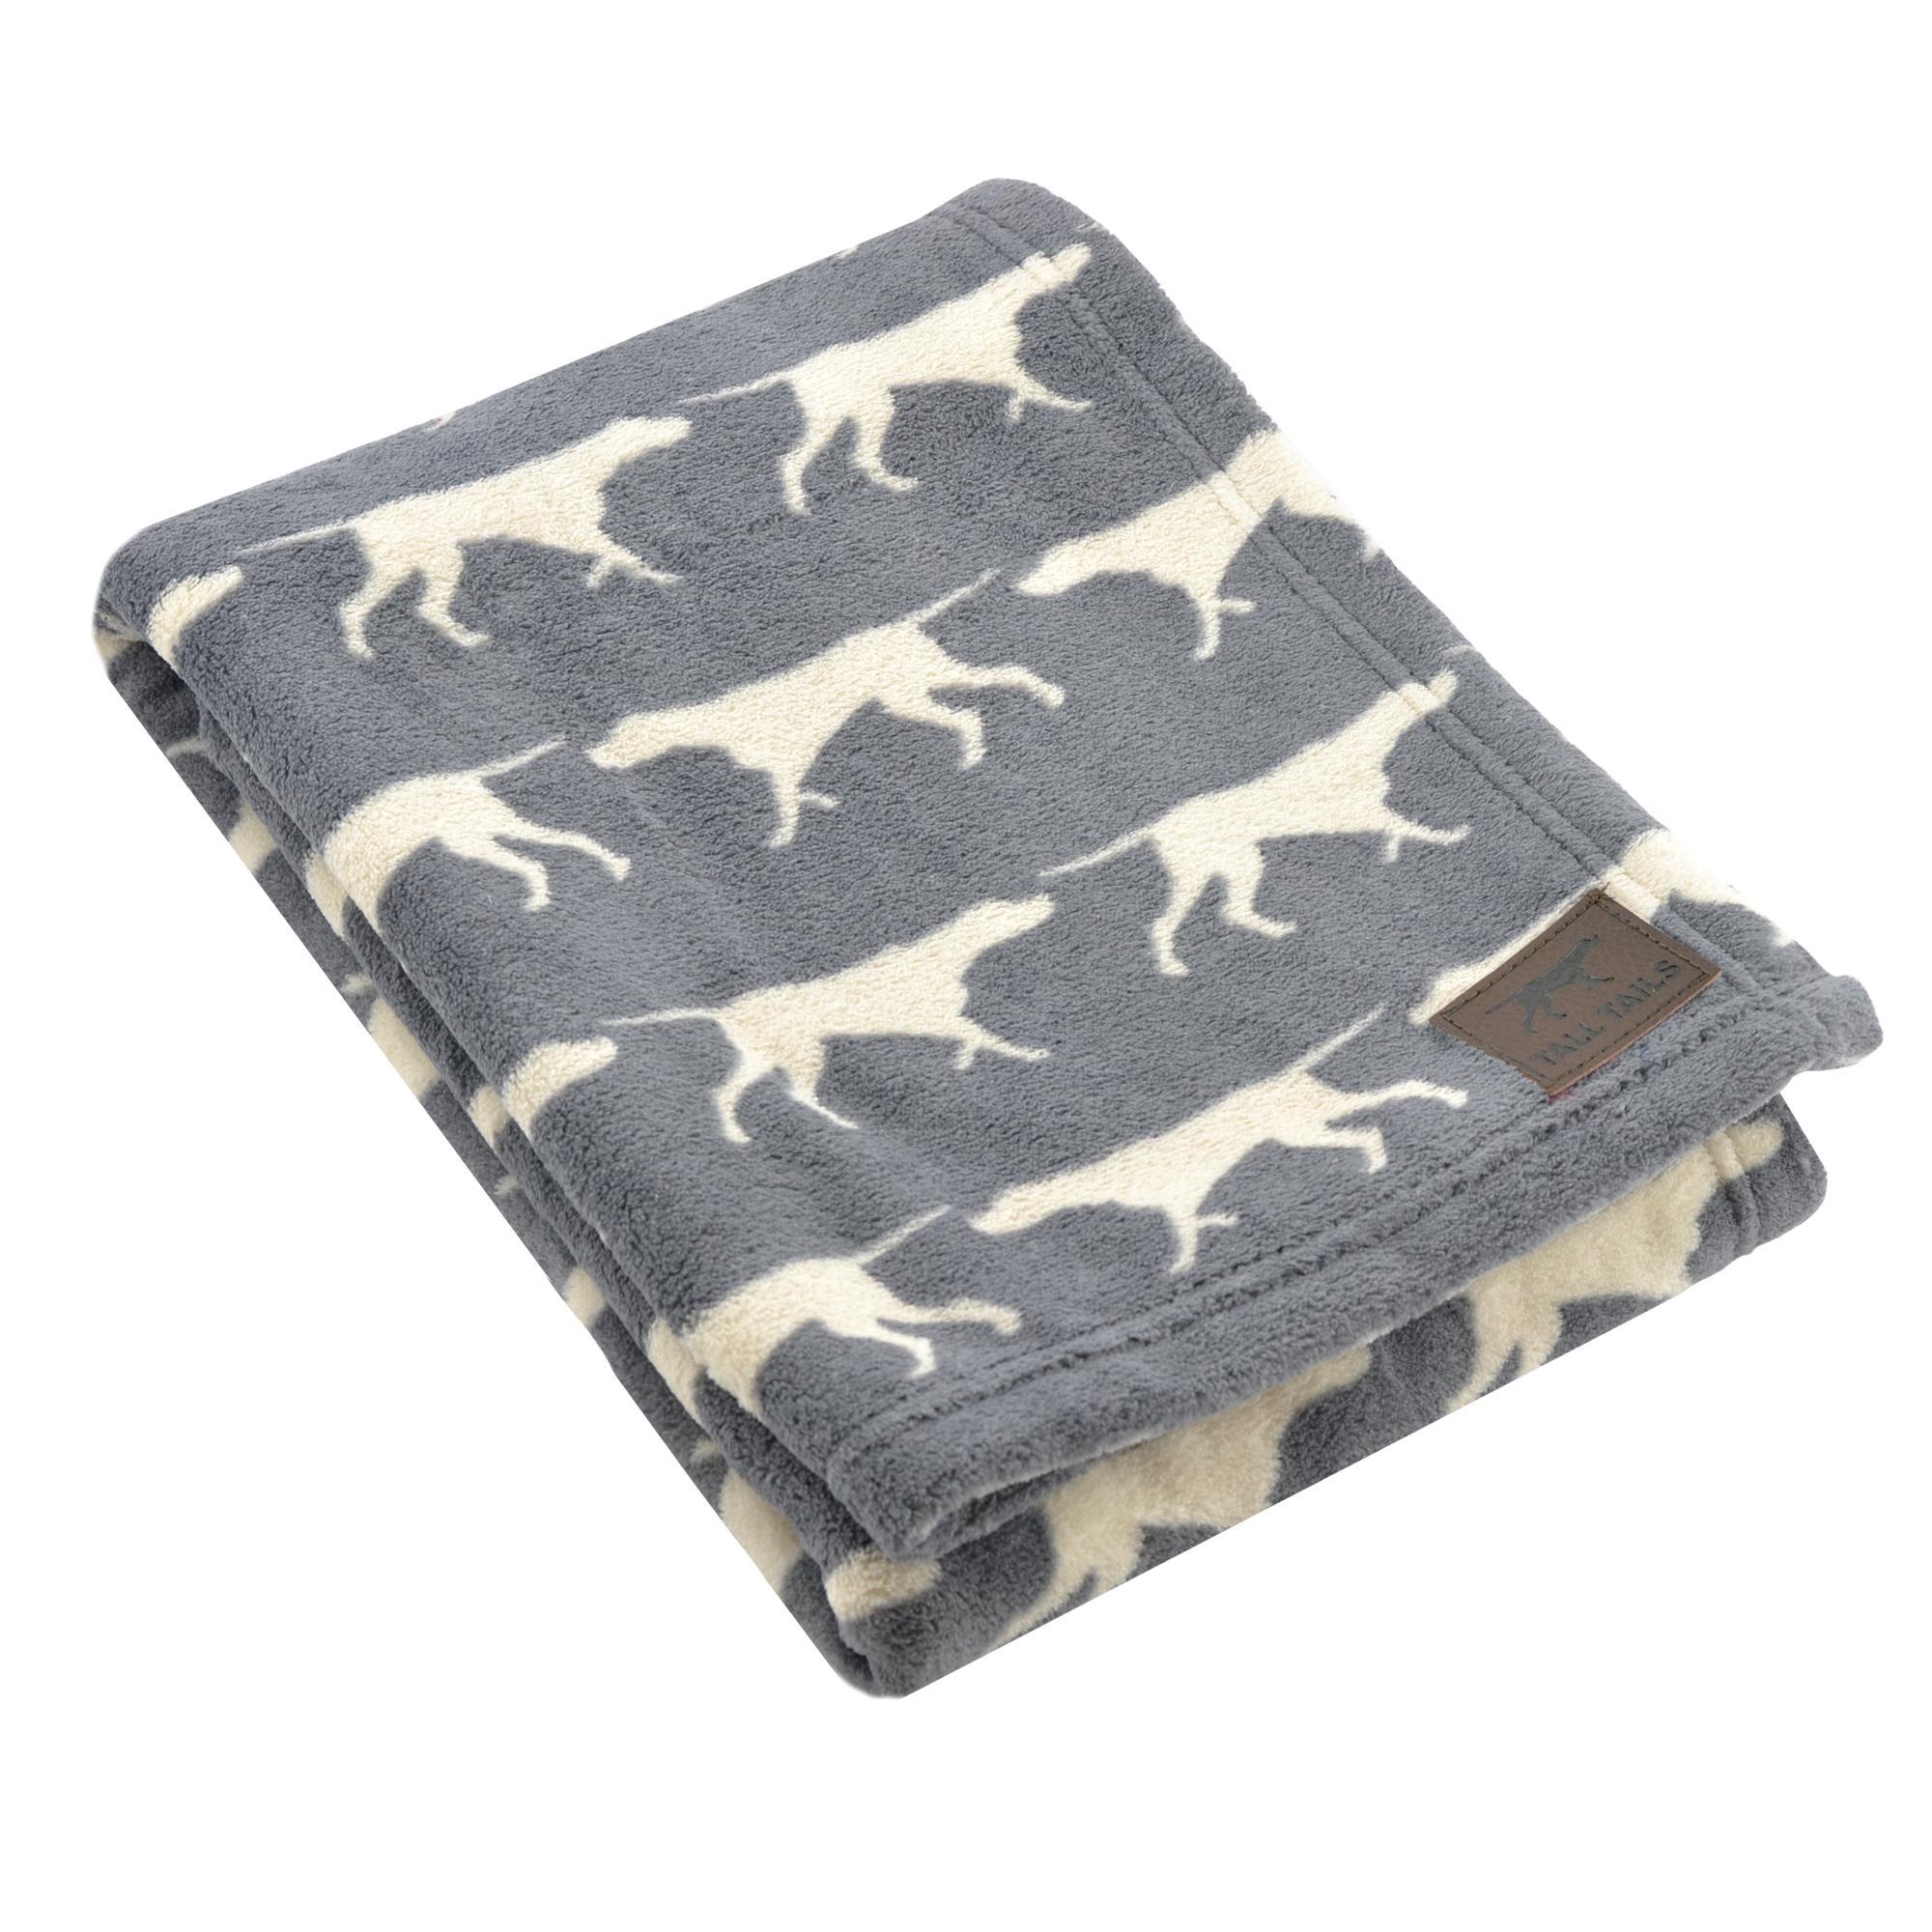 Tall Tails Grey Icon Fleece Dog Blanket, 20 x 30